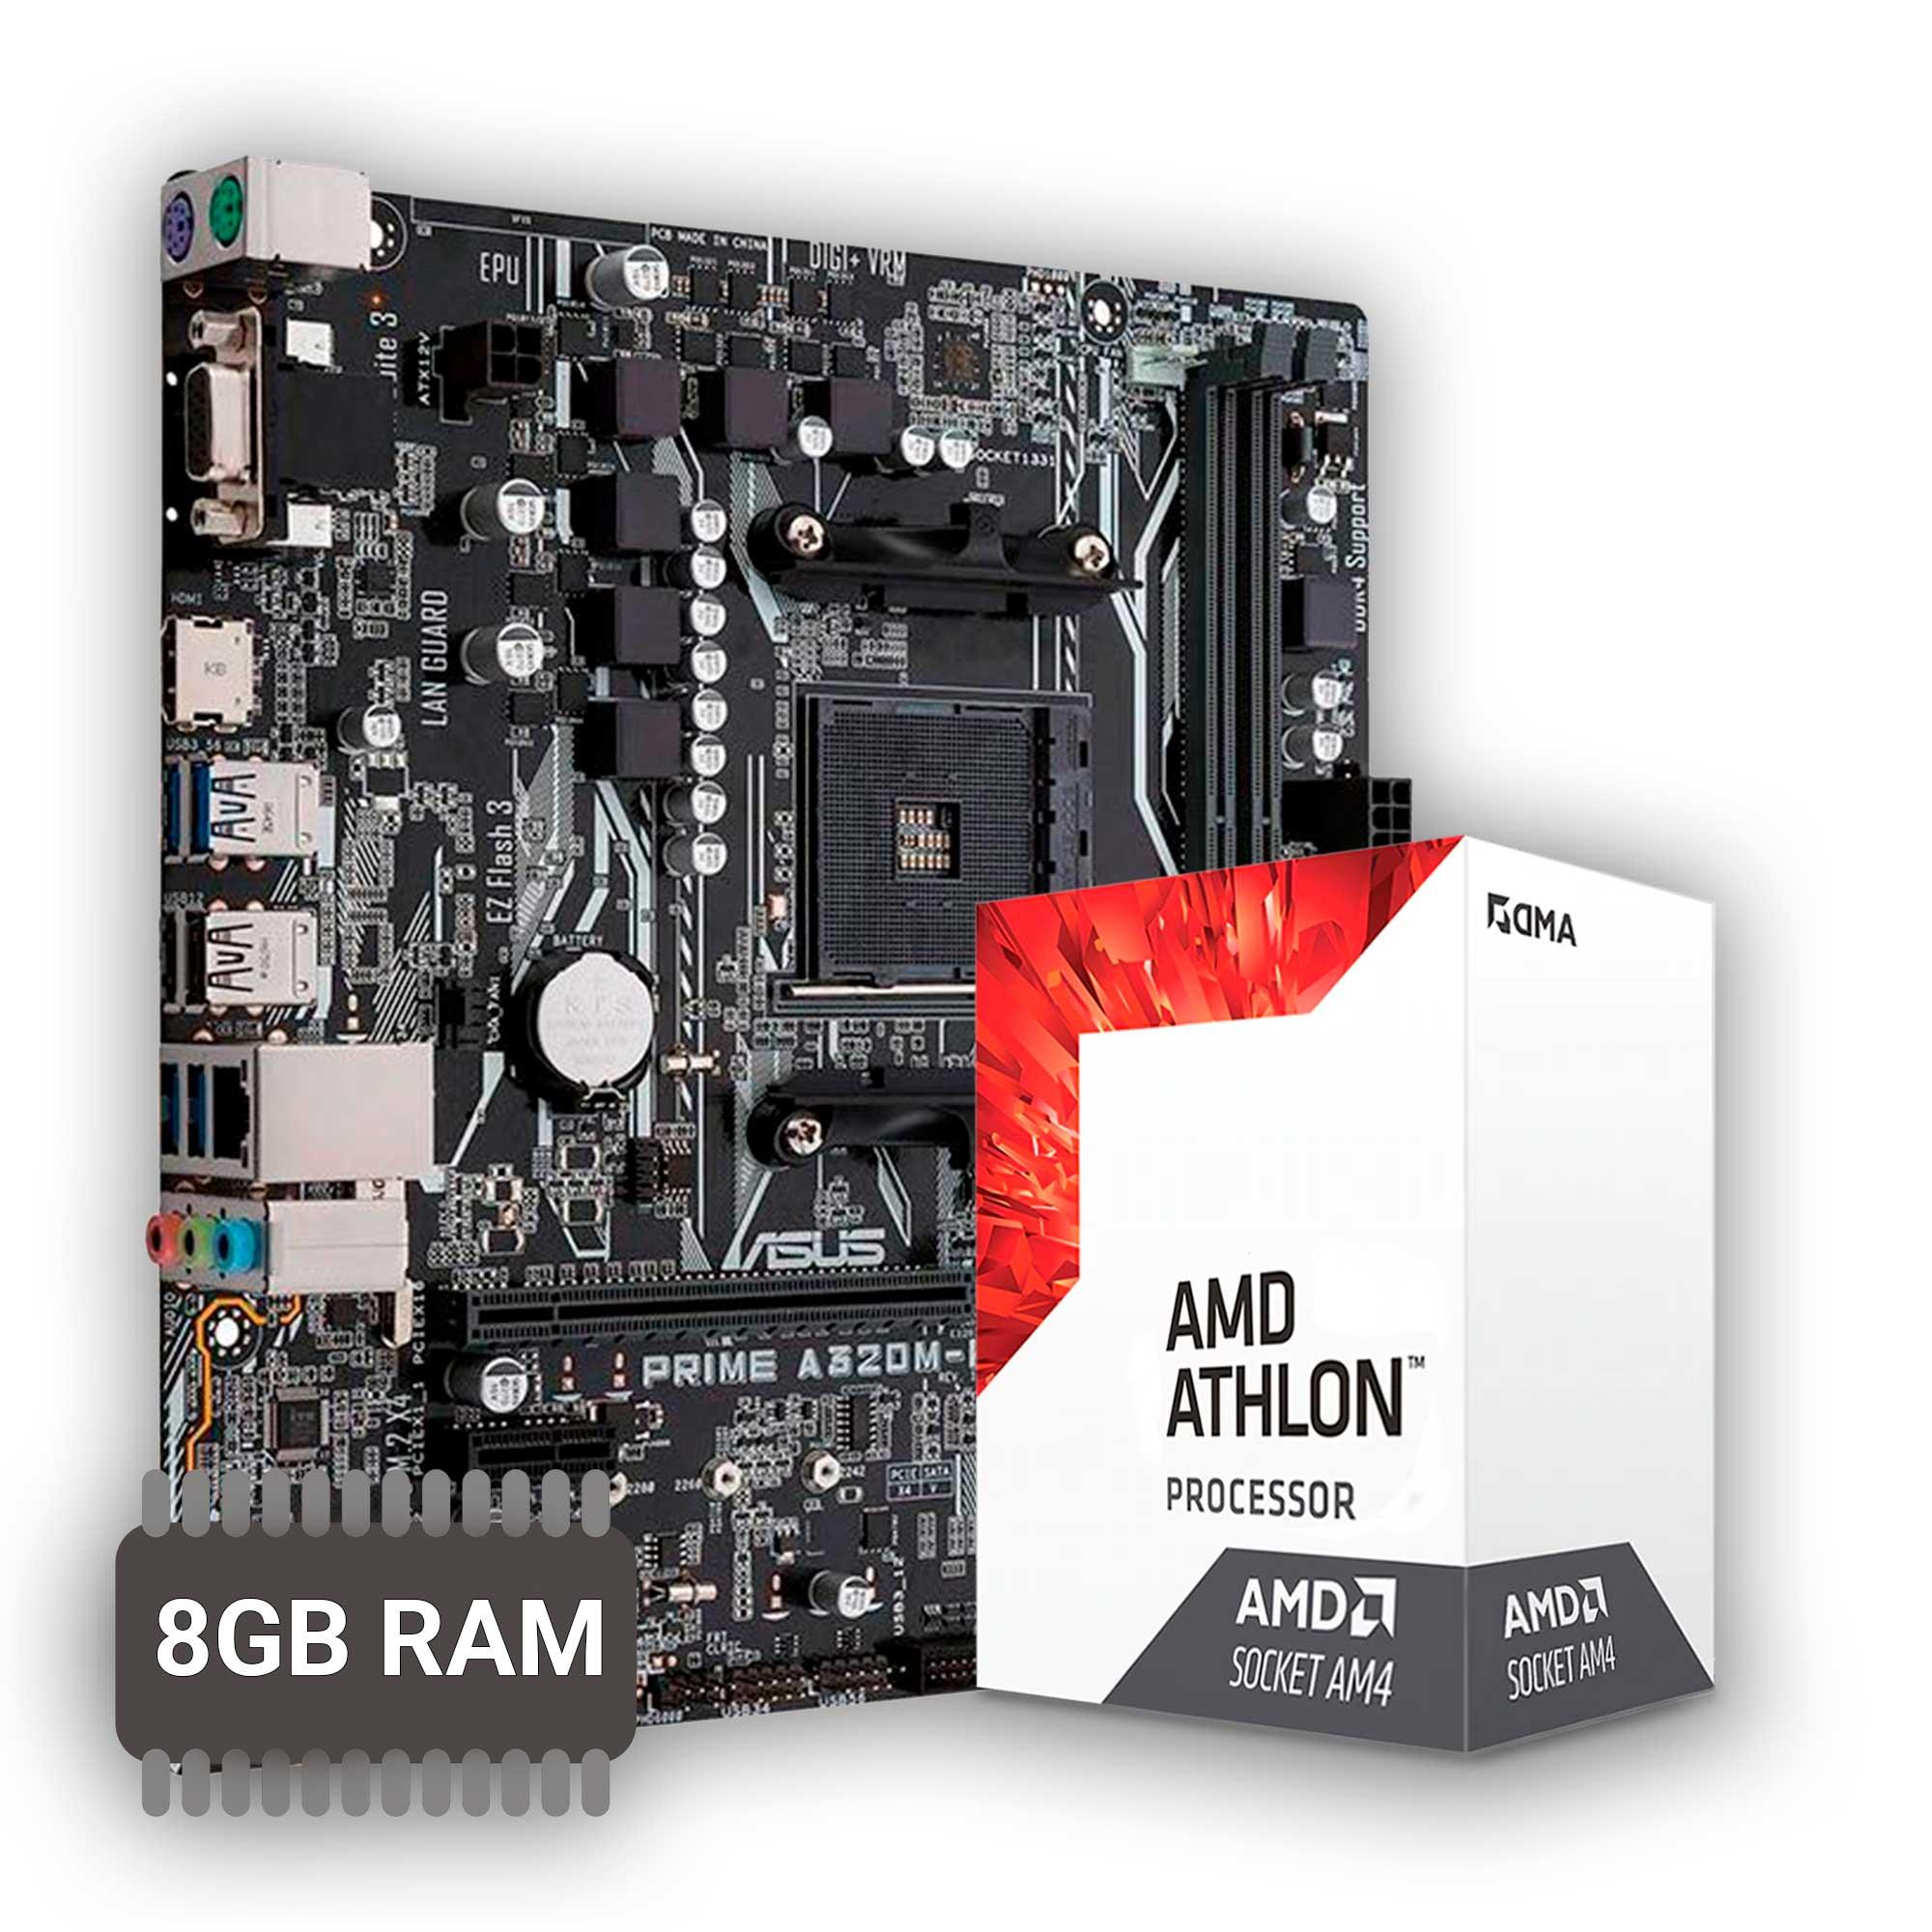 Kit Upgrade Placa mãe A320M + Processador A12 9800 + 8GB DDR4 (2x4)